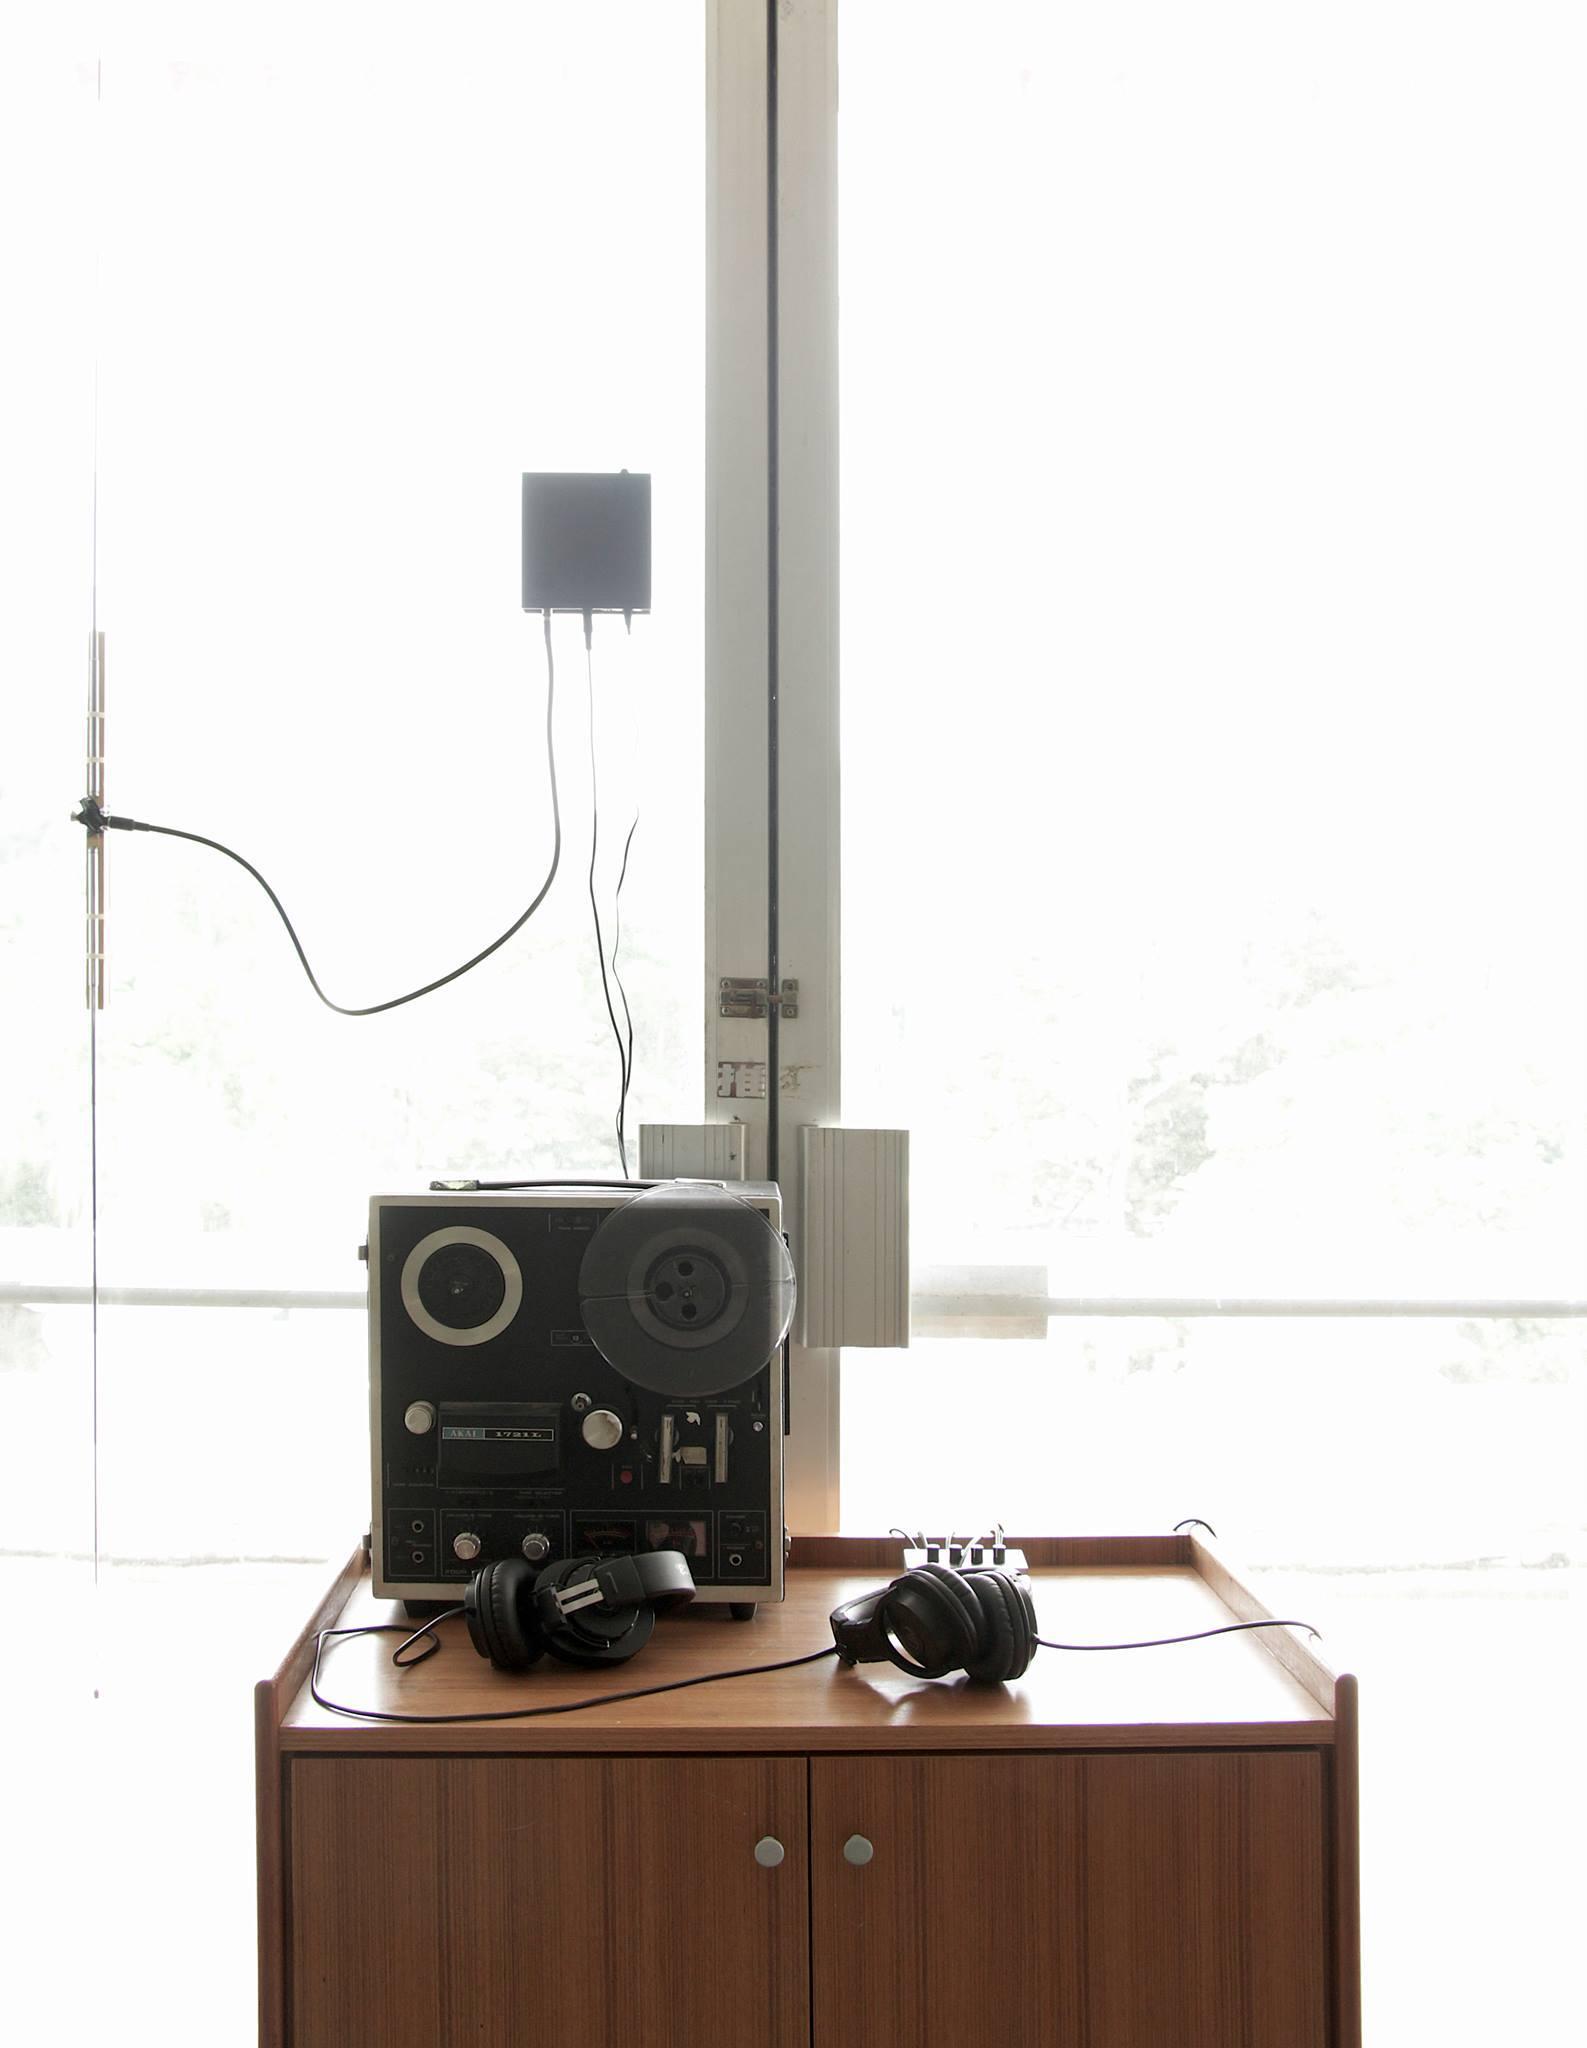 06 reel to reel and radio transmitter.jpg